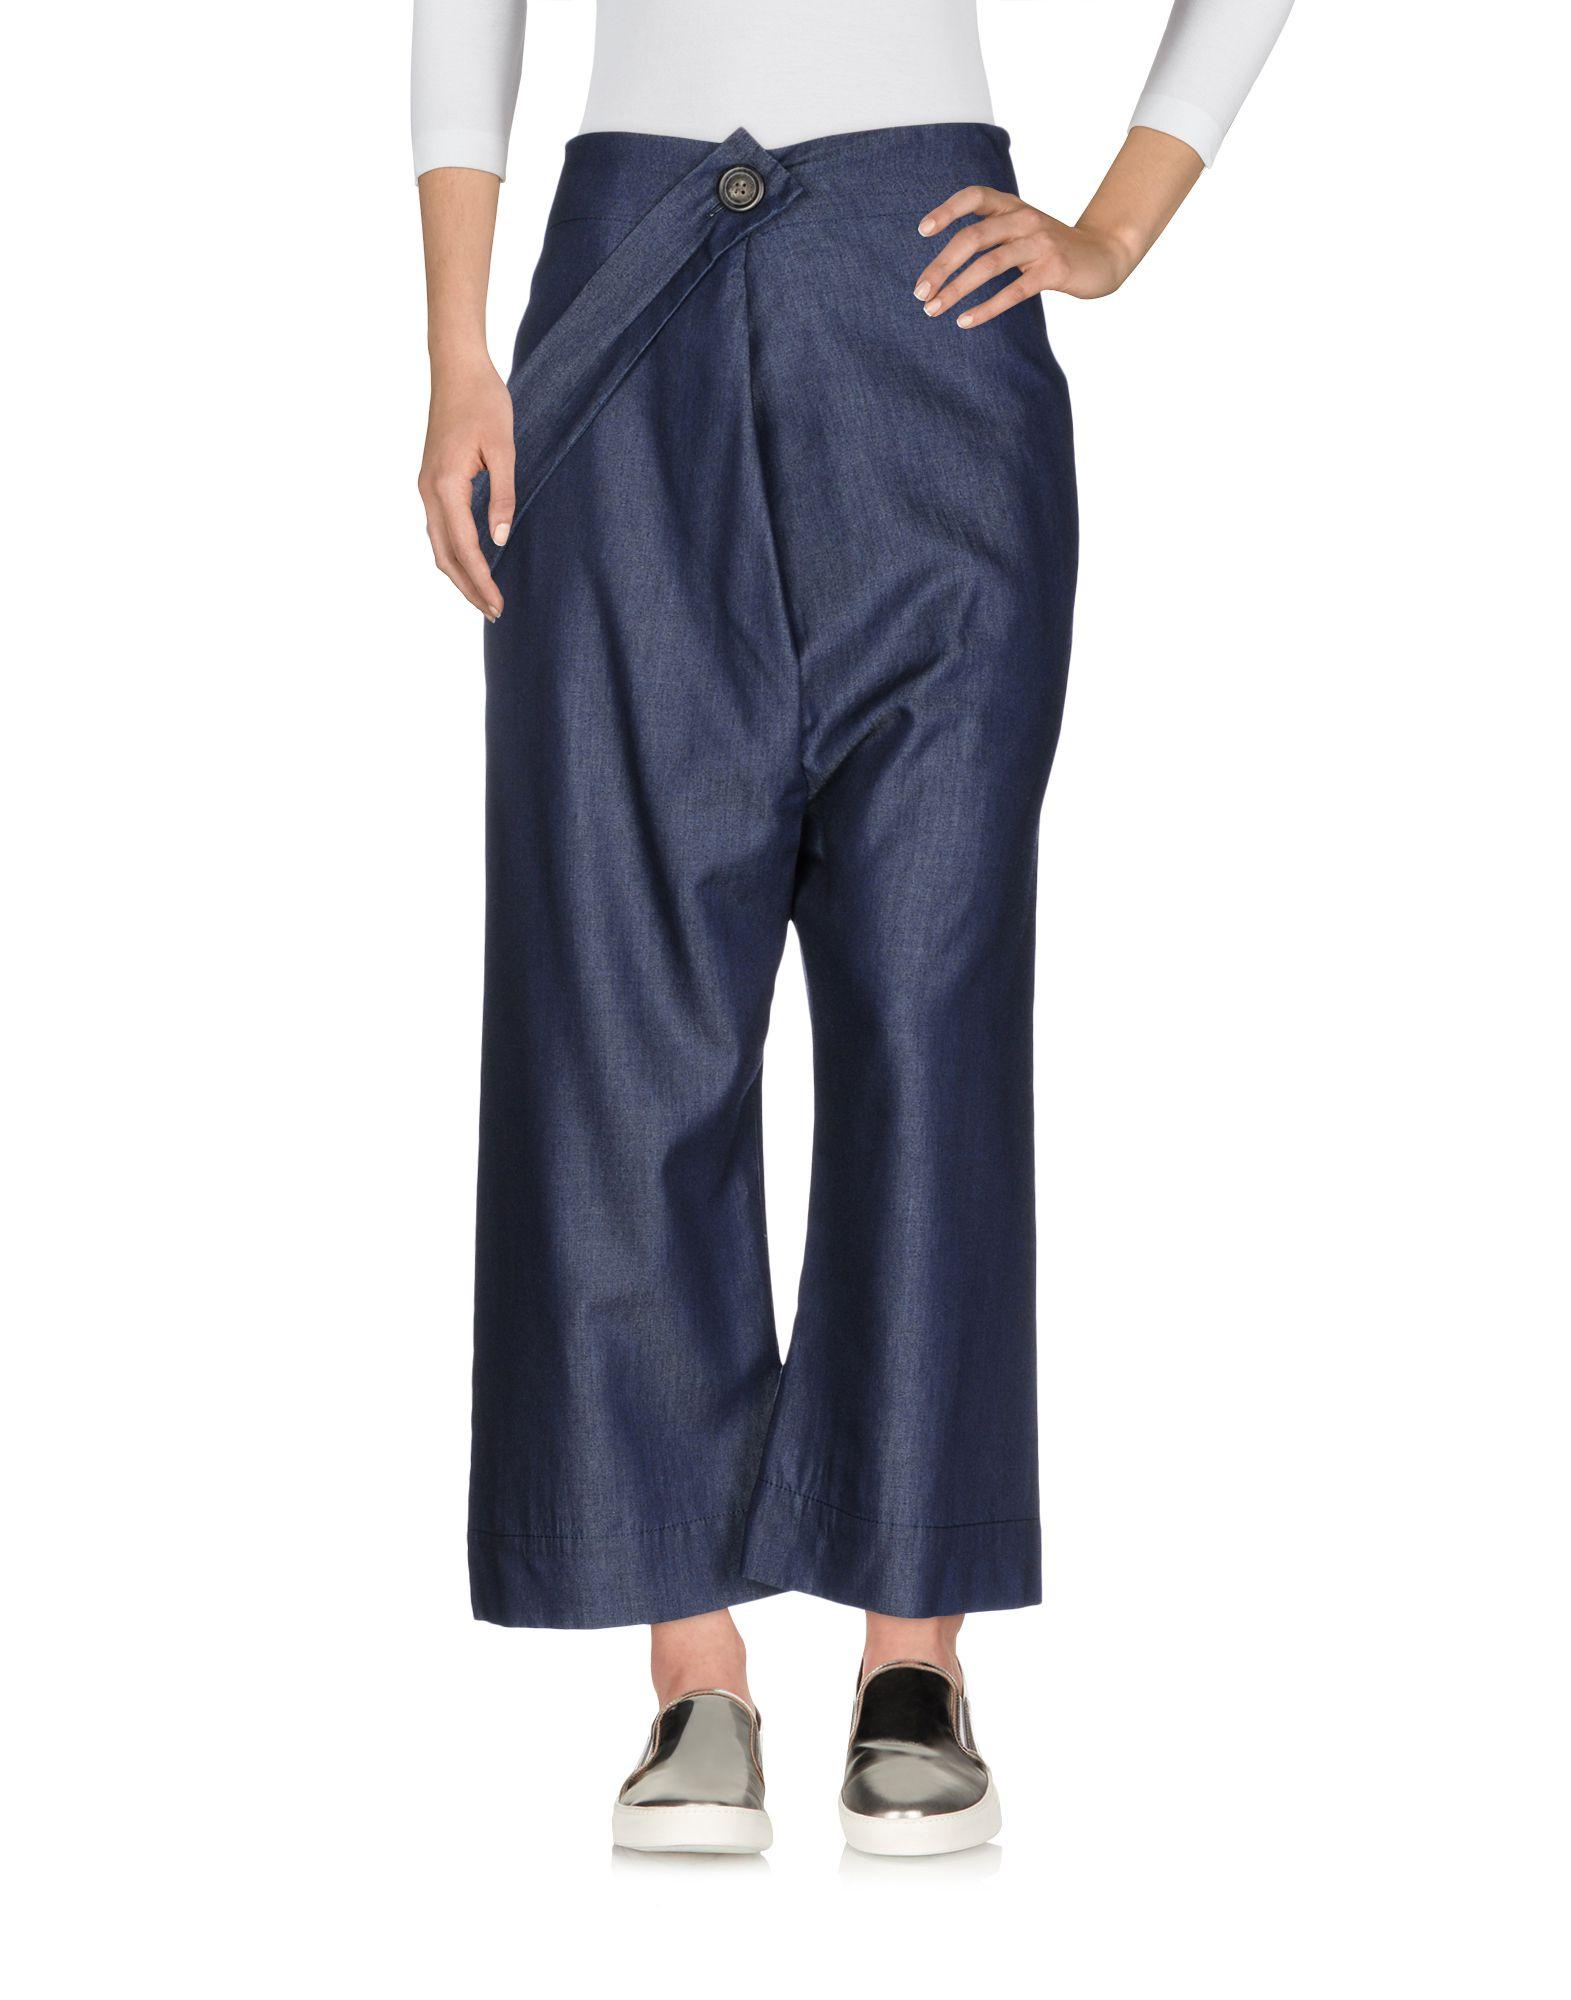 VIVIENNE WESTWOOD ANGLOMANIA Джинсовые брюки-капри рюкзак vivienne westwood vivienne westwood vi873bwvbz09